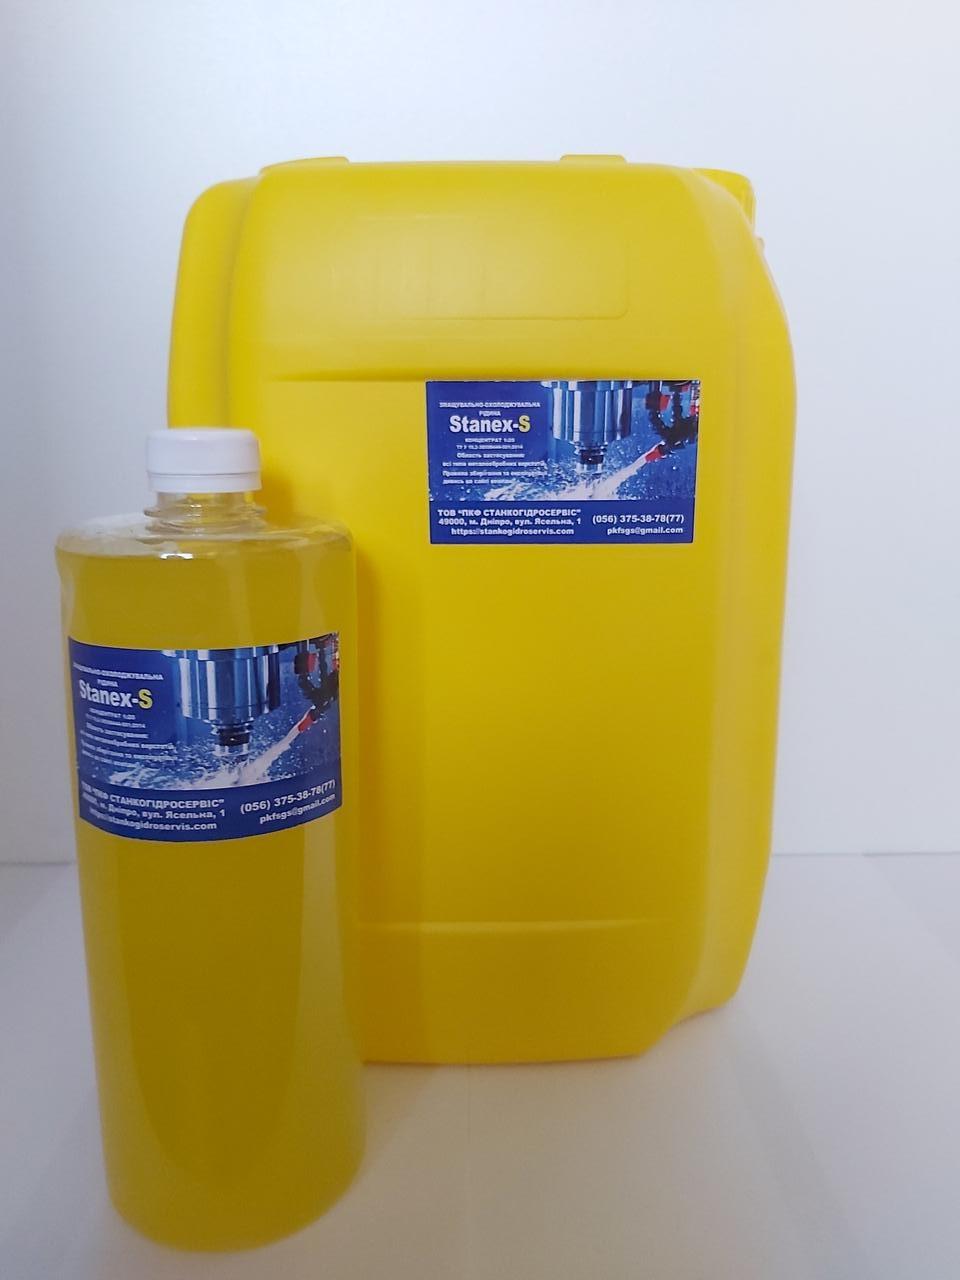 Смазочно-охлаждающая жидкость (СОЖ) Stanex S 5 литров